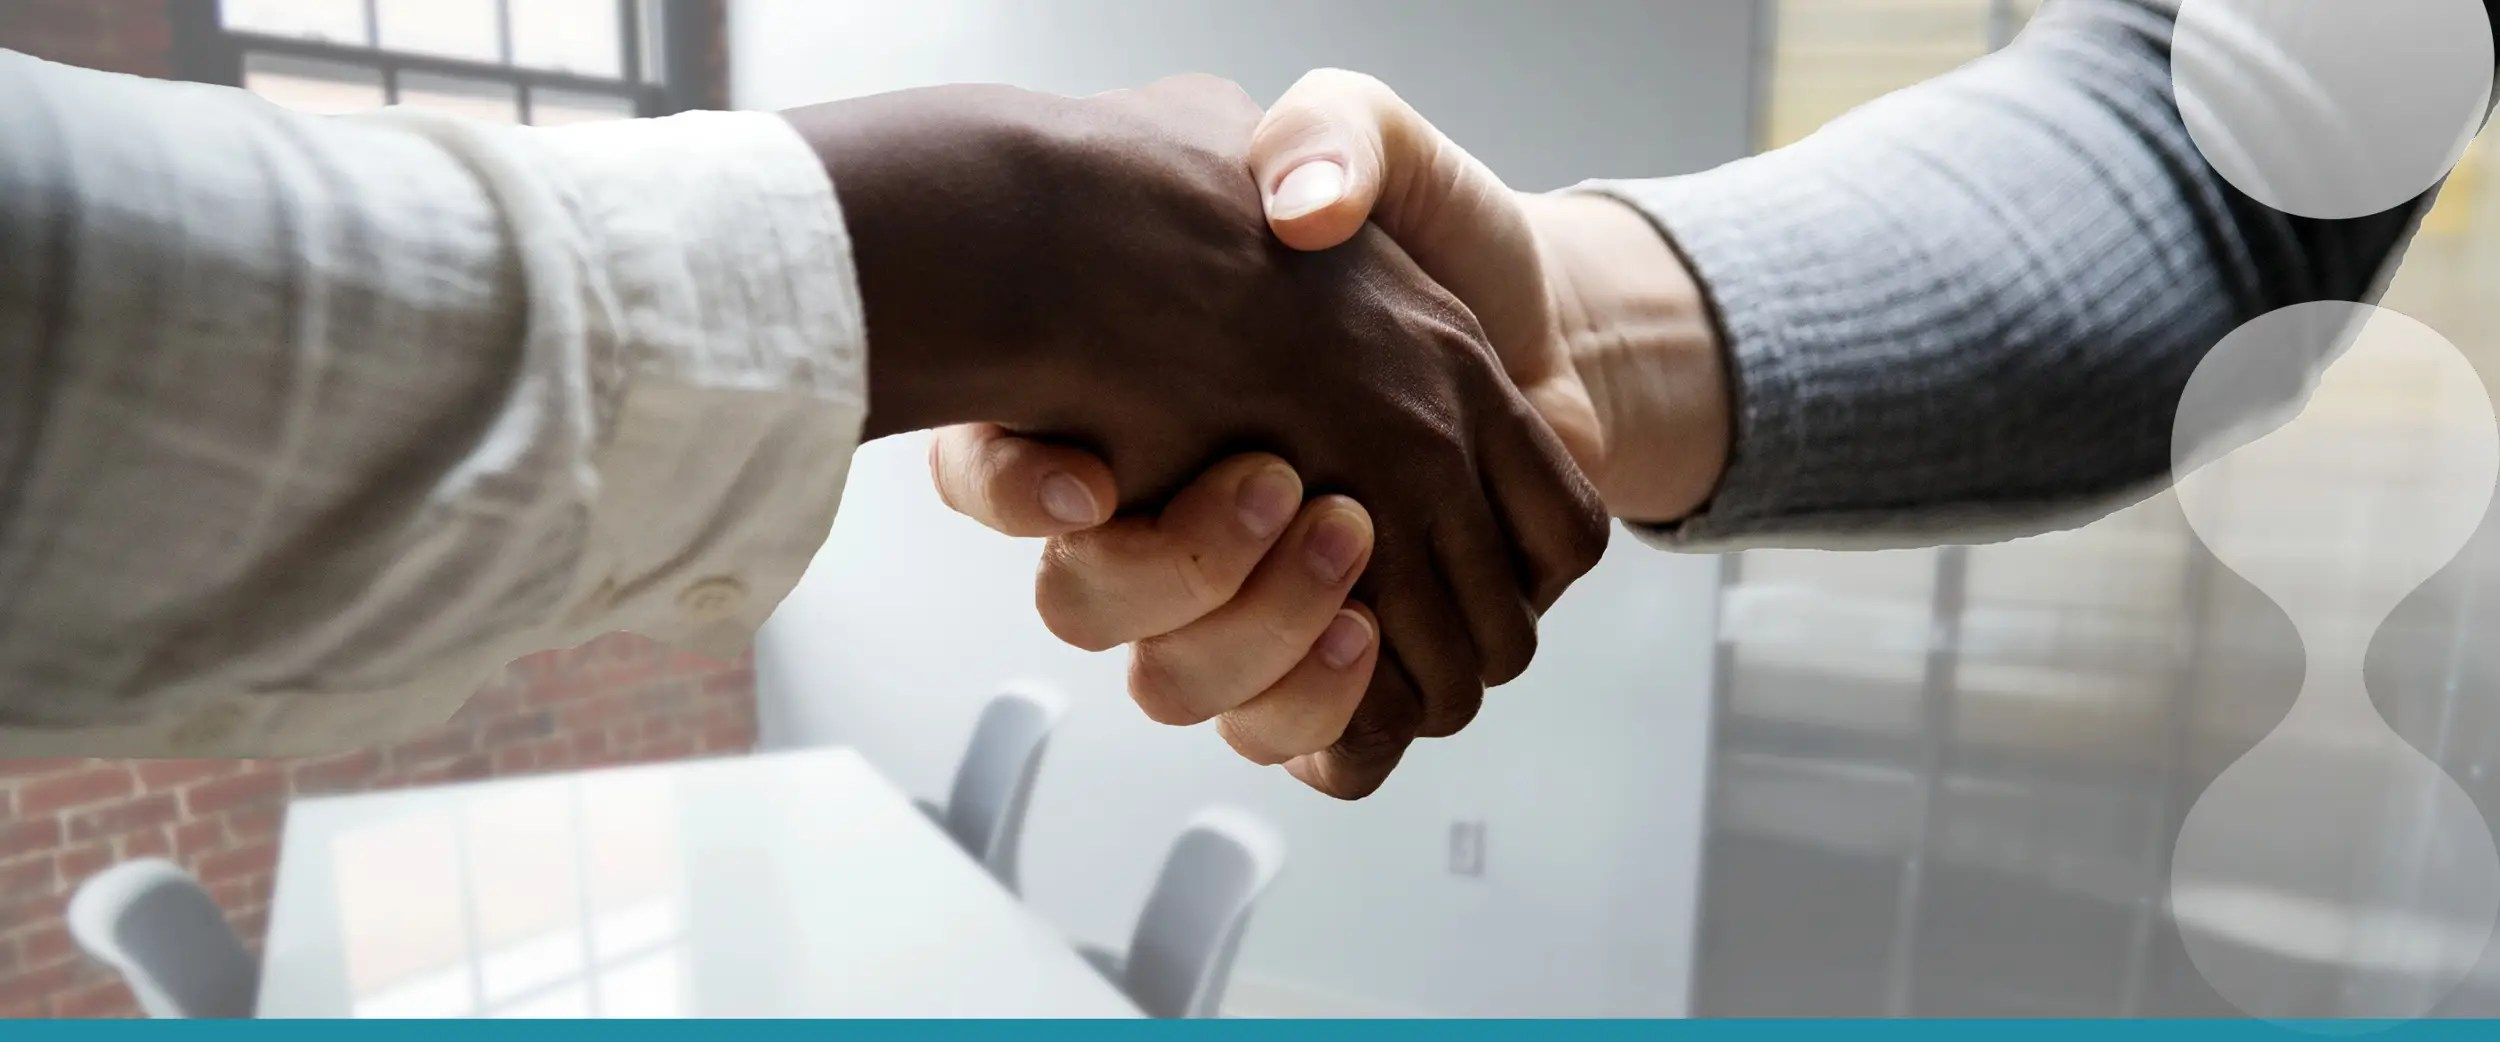 healthcare hiring handshake